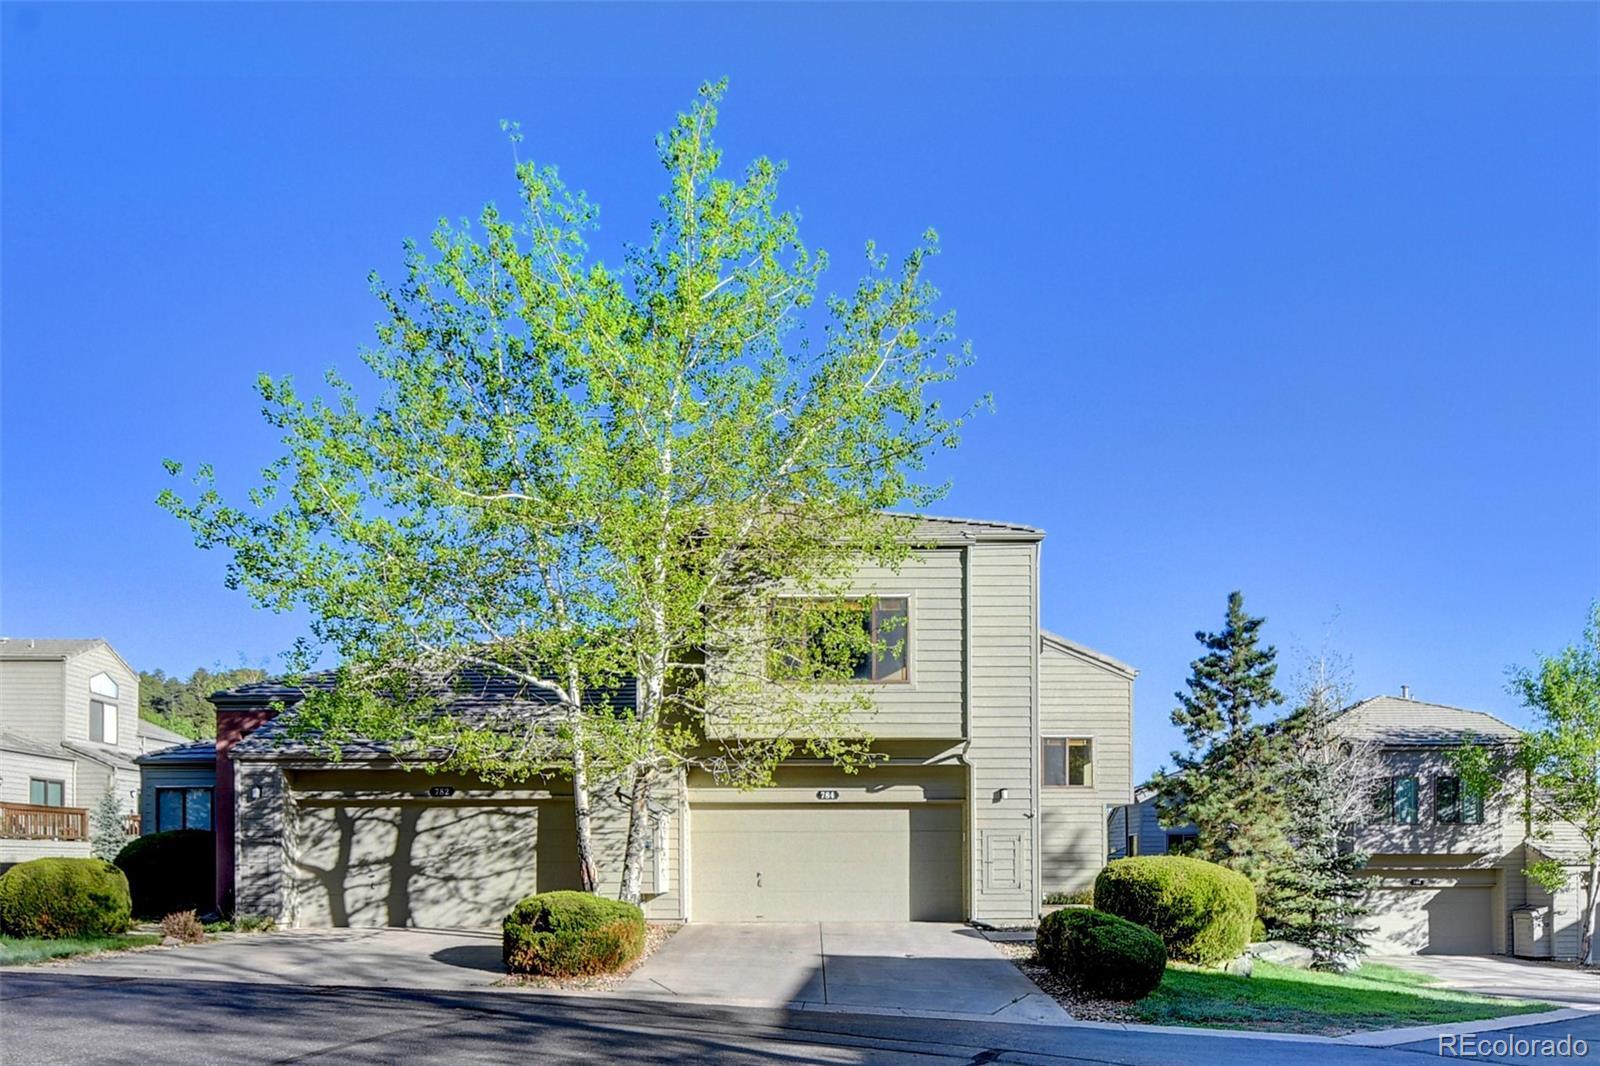 MLS# 2971781 - 3 - 784 Chimney Creek Drive #B, Golden, CO 80401